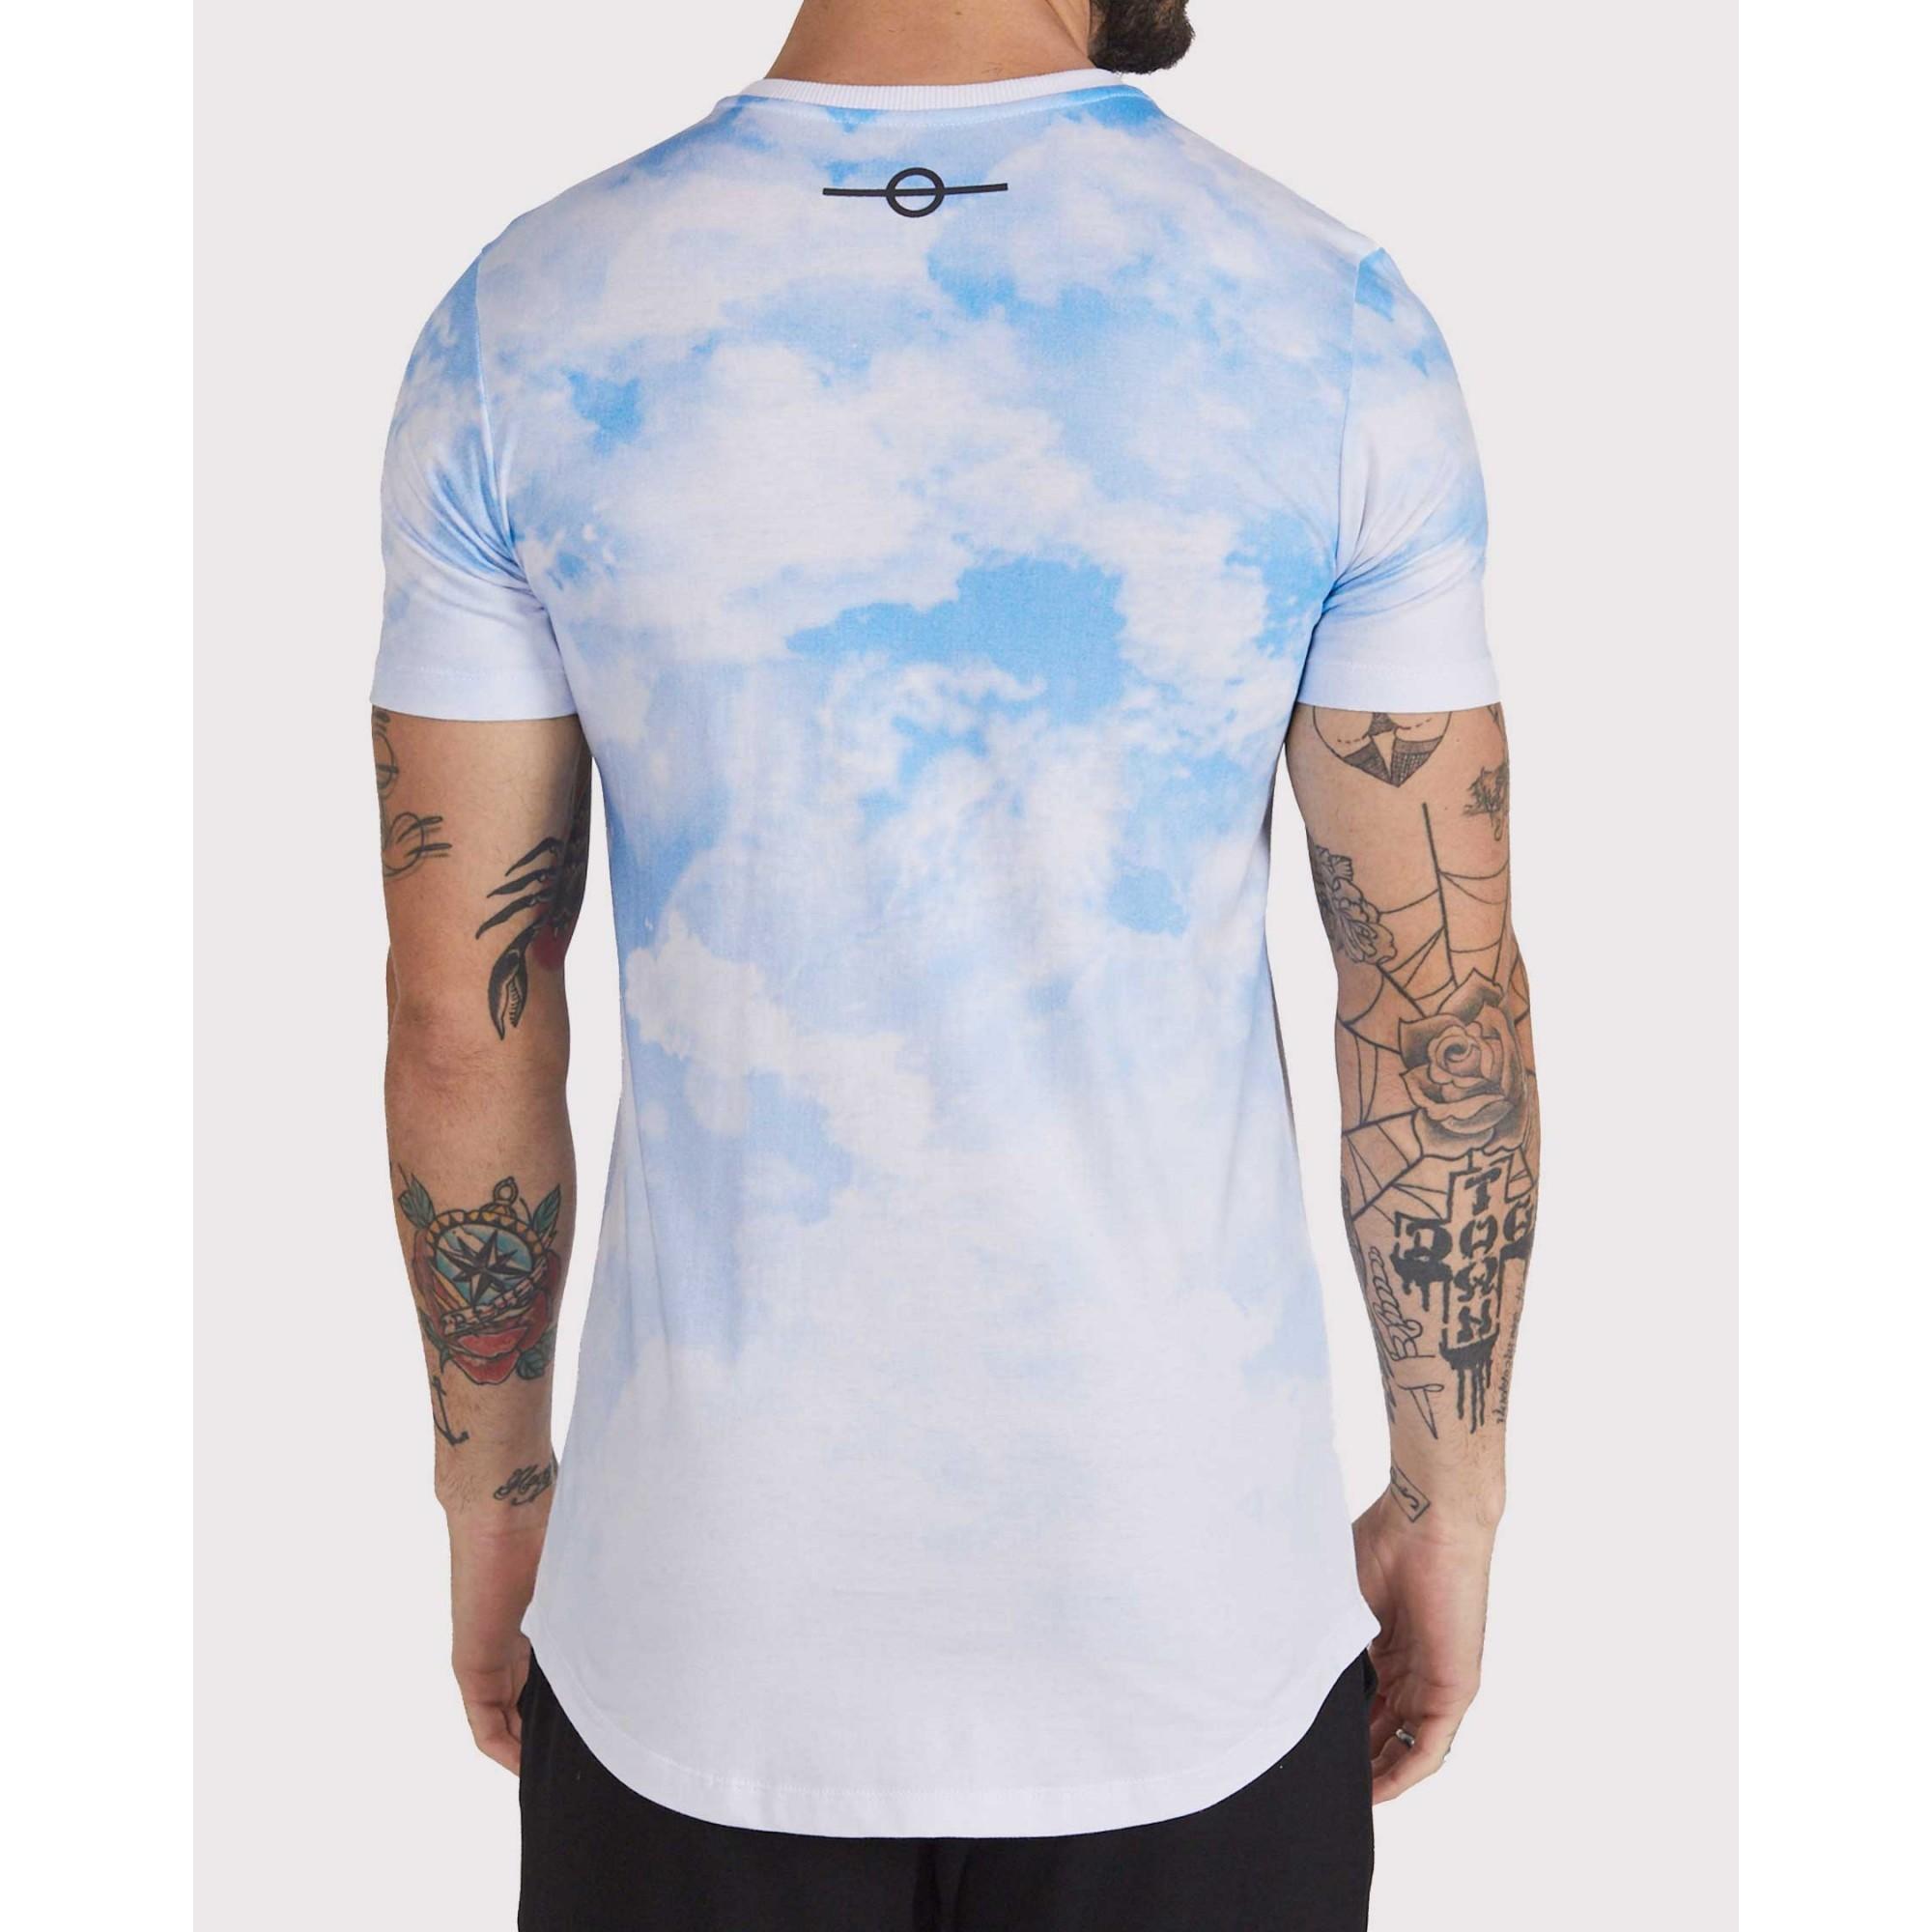 Camiseta Buh Sky White & Blue